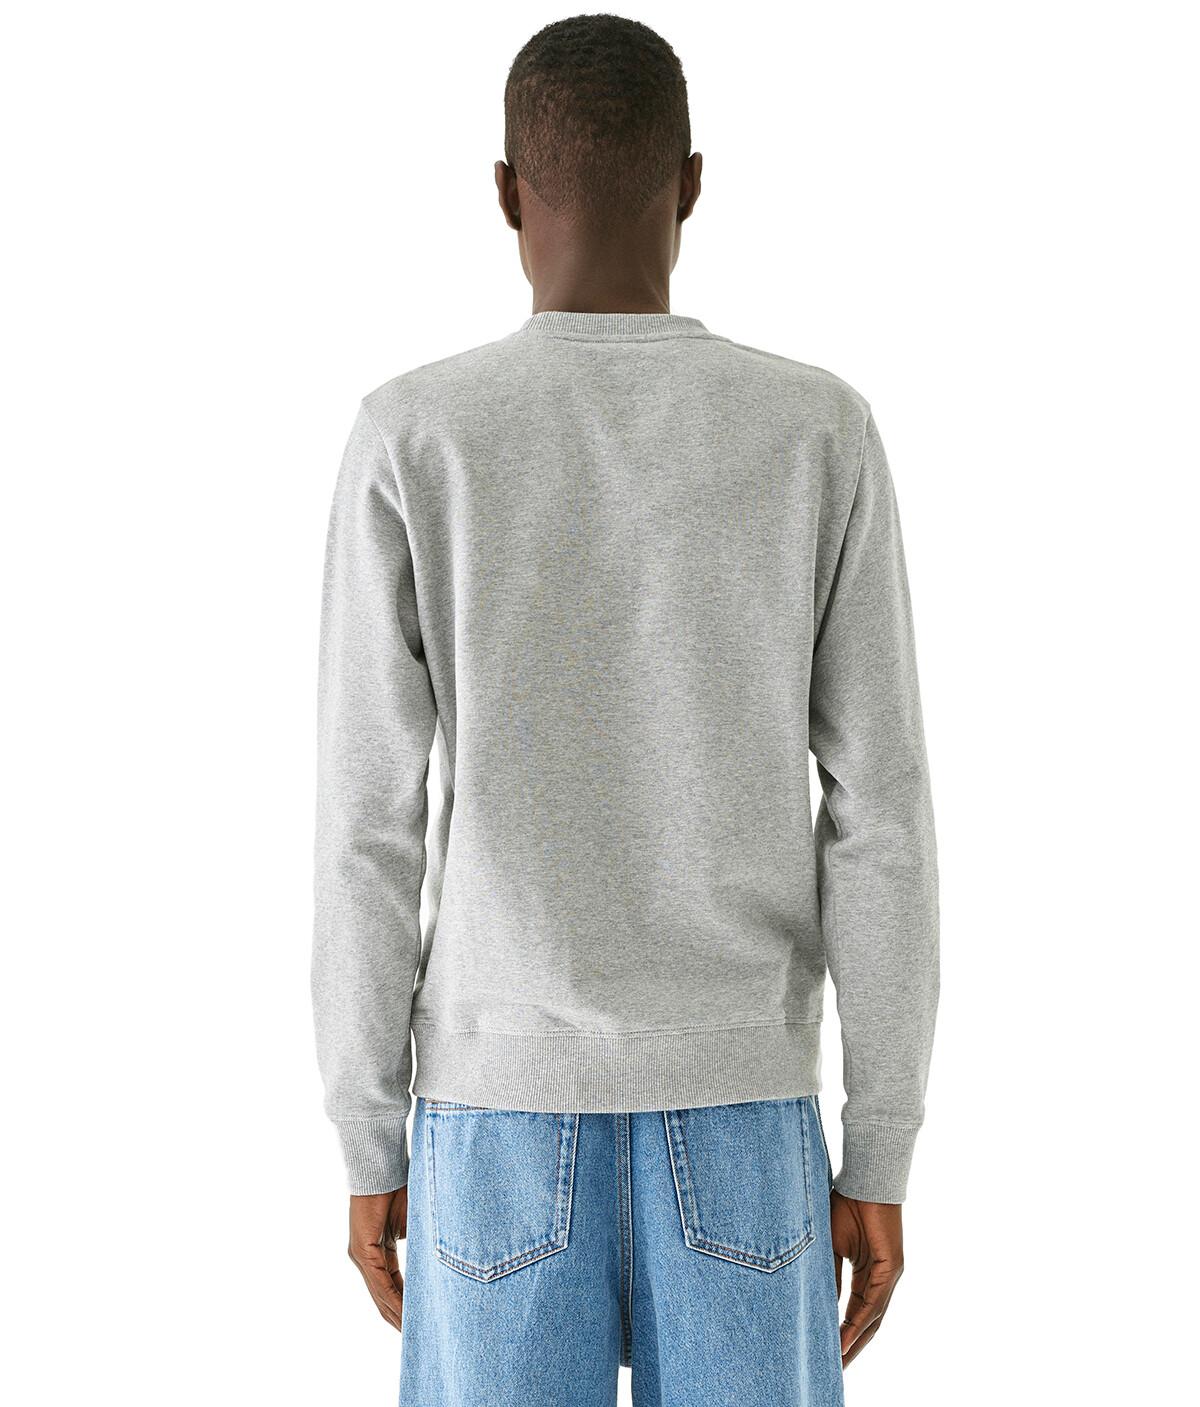 LOEWE Anagram Sweatshirt Grey front